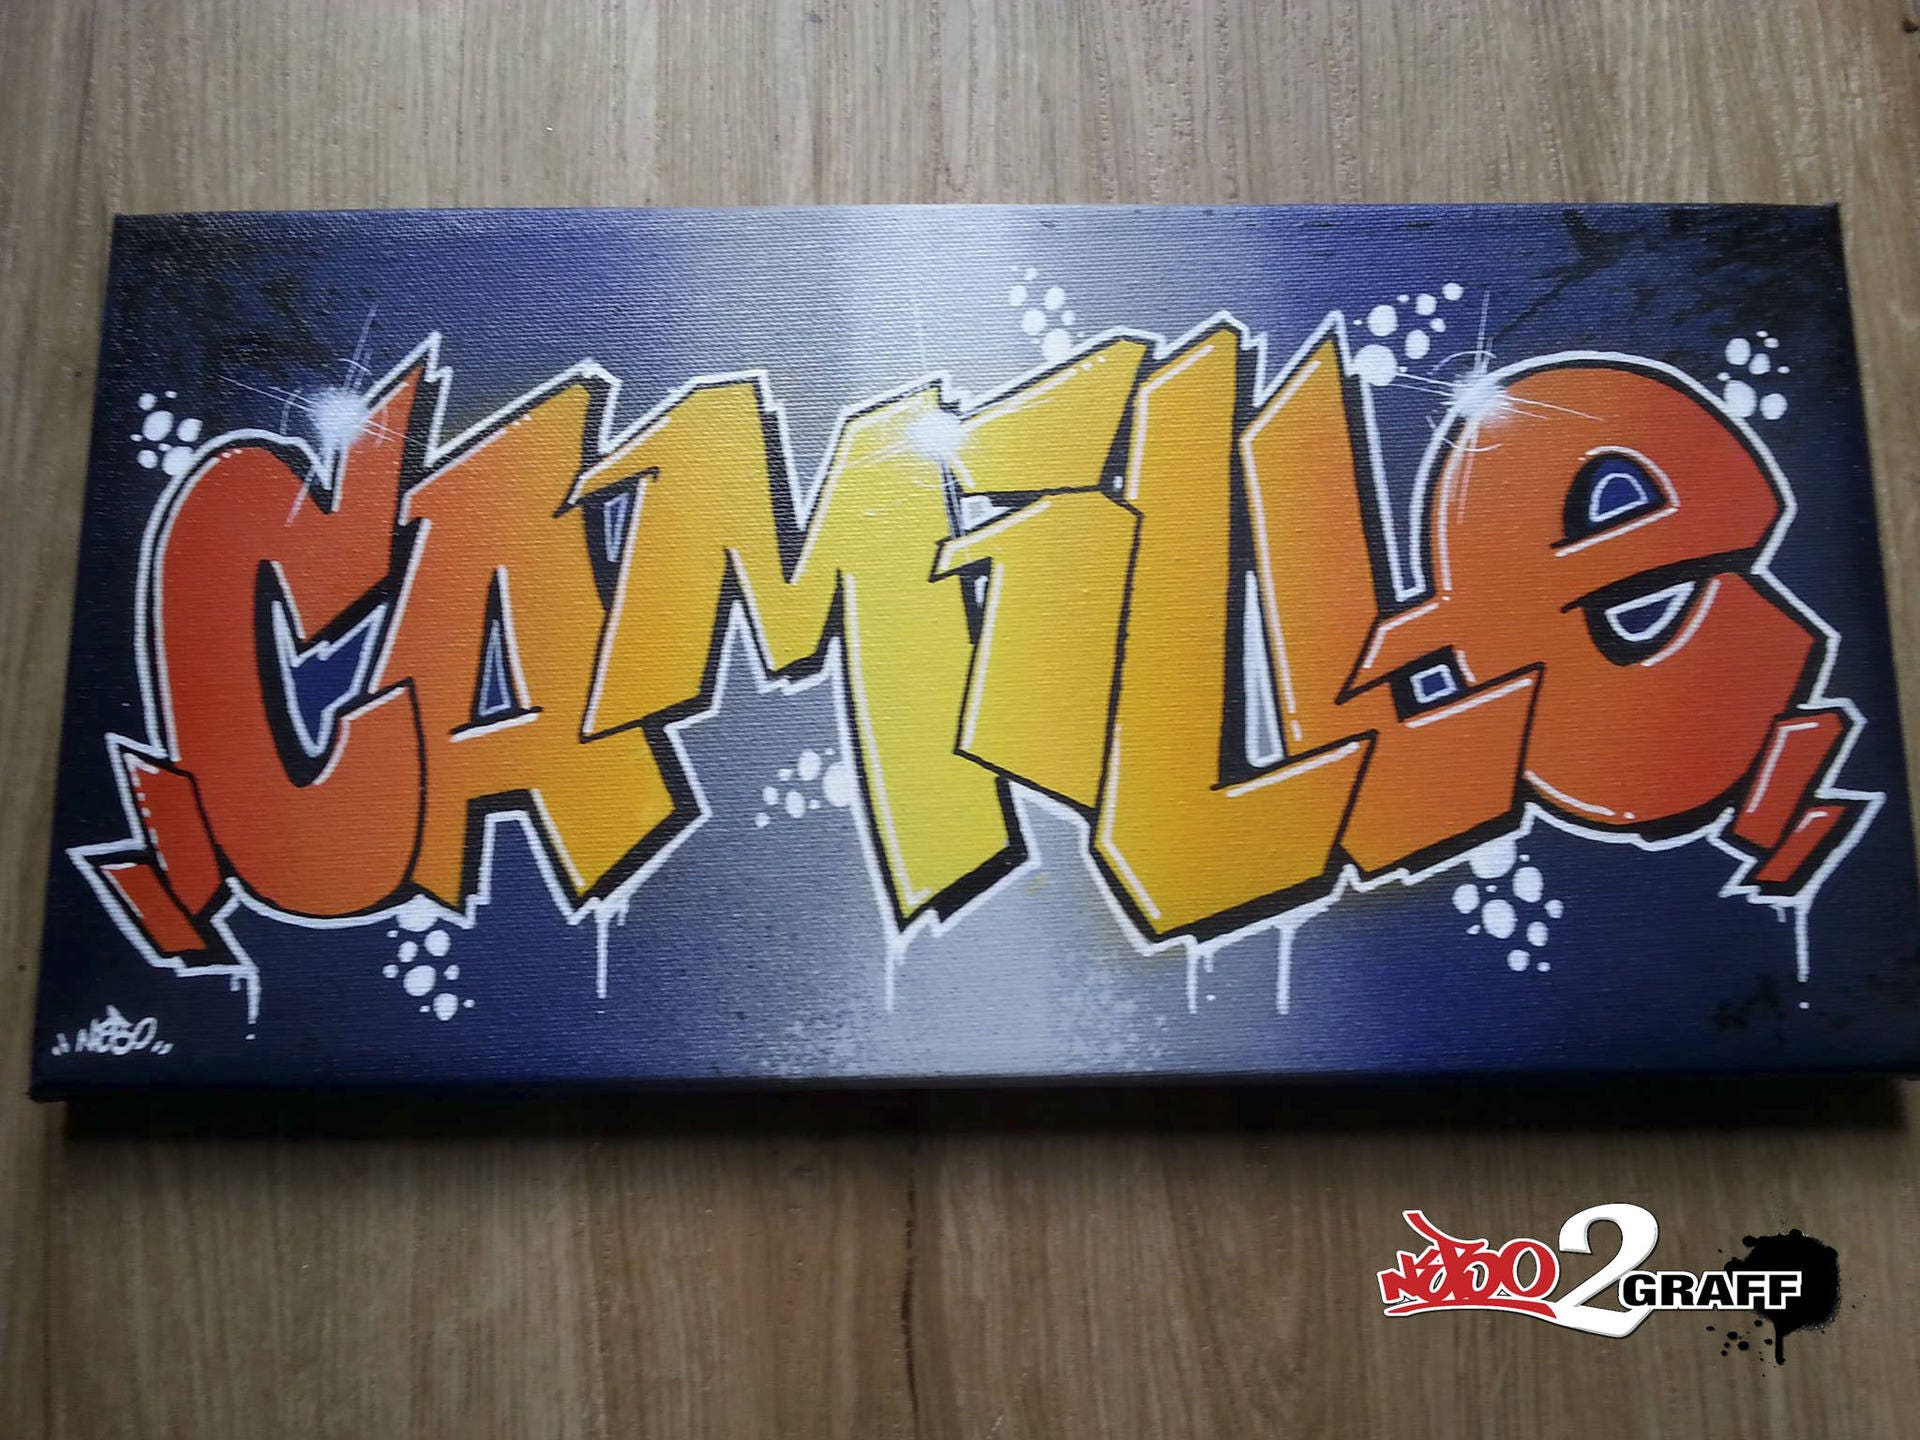 tableau toile graffiti prénom idée cadeau originale graff déco